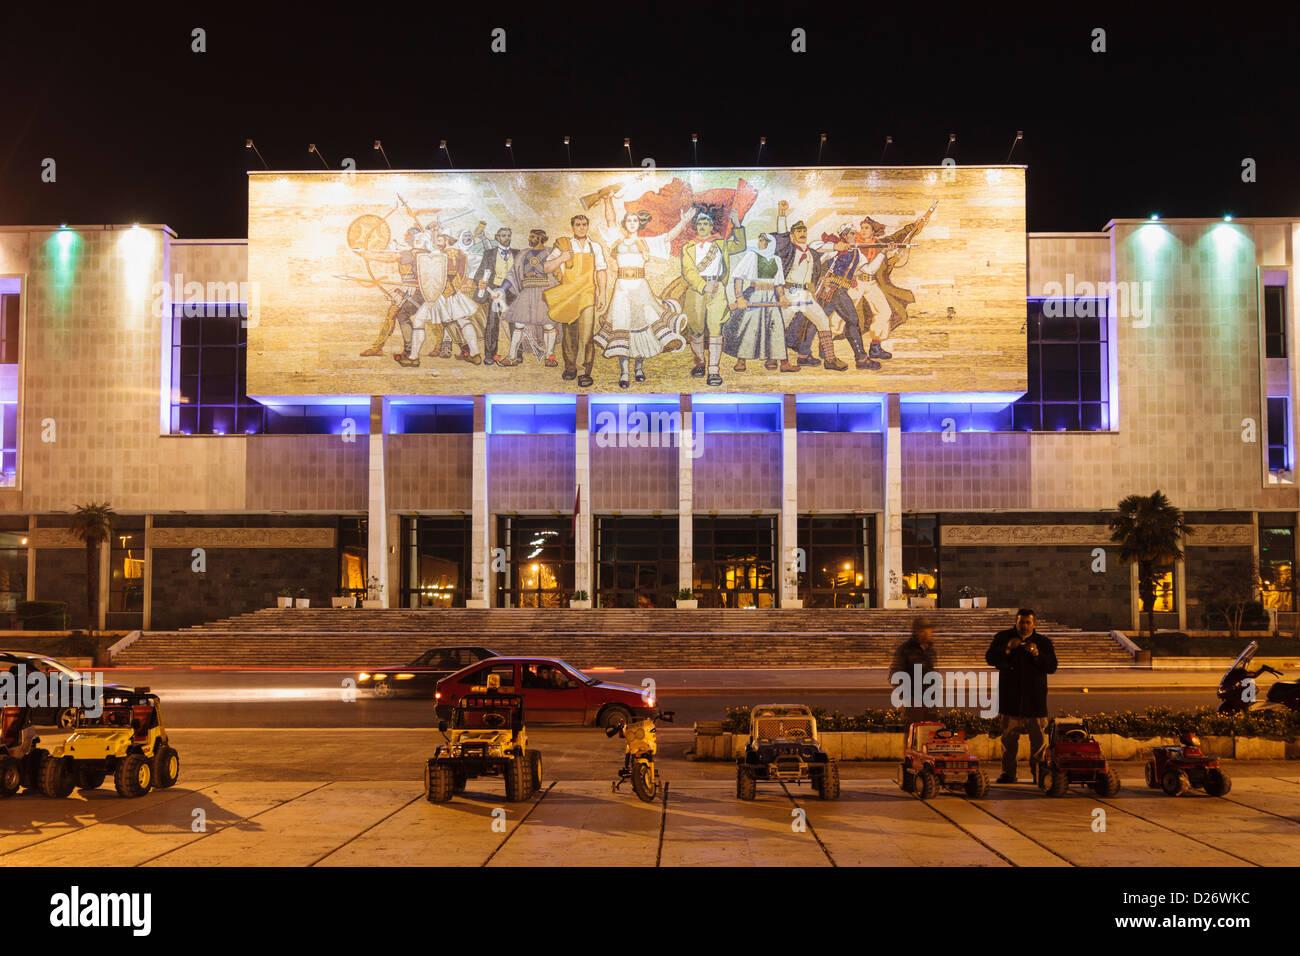 National Historical Museum at night. Tirana, Albania - Stock Image